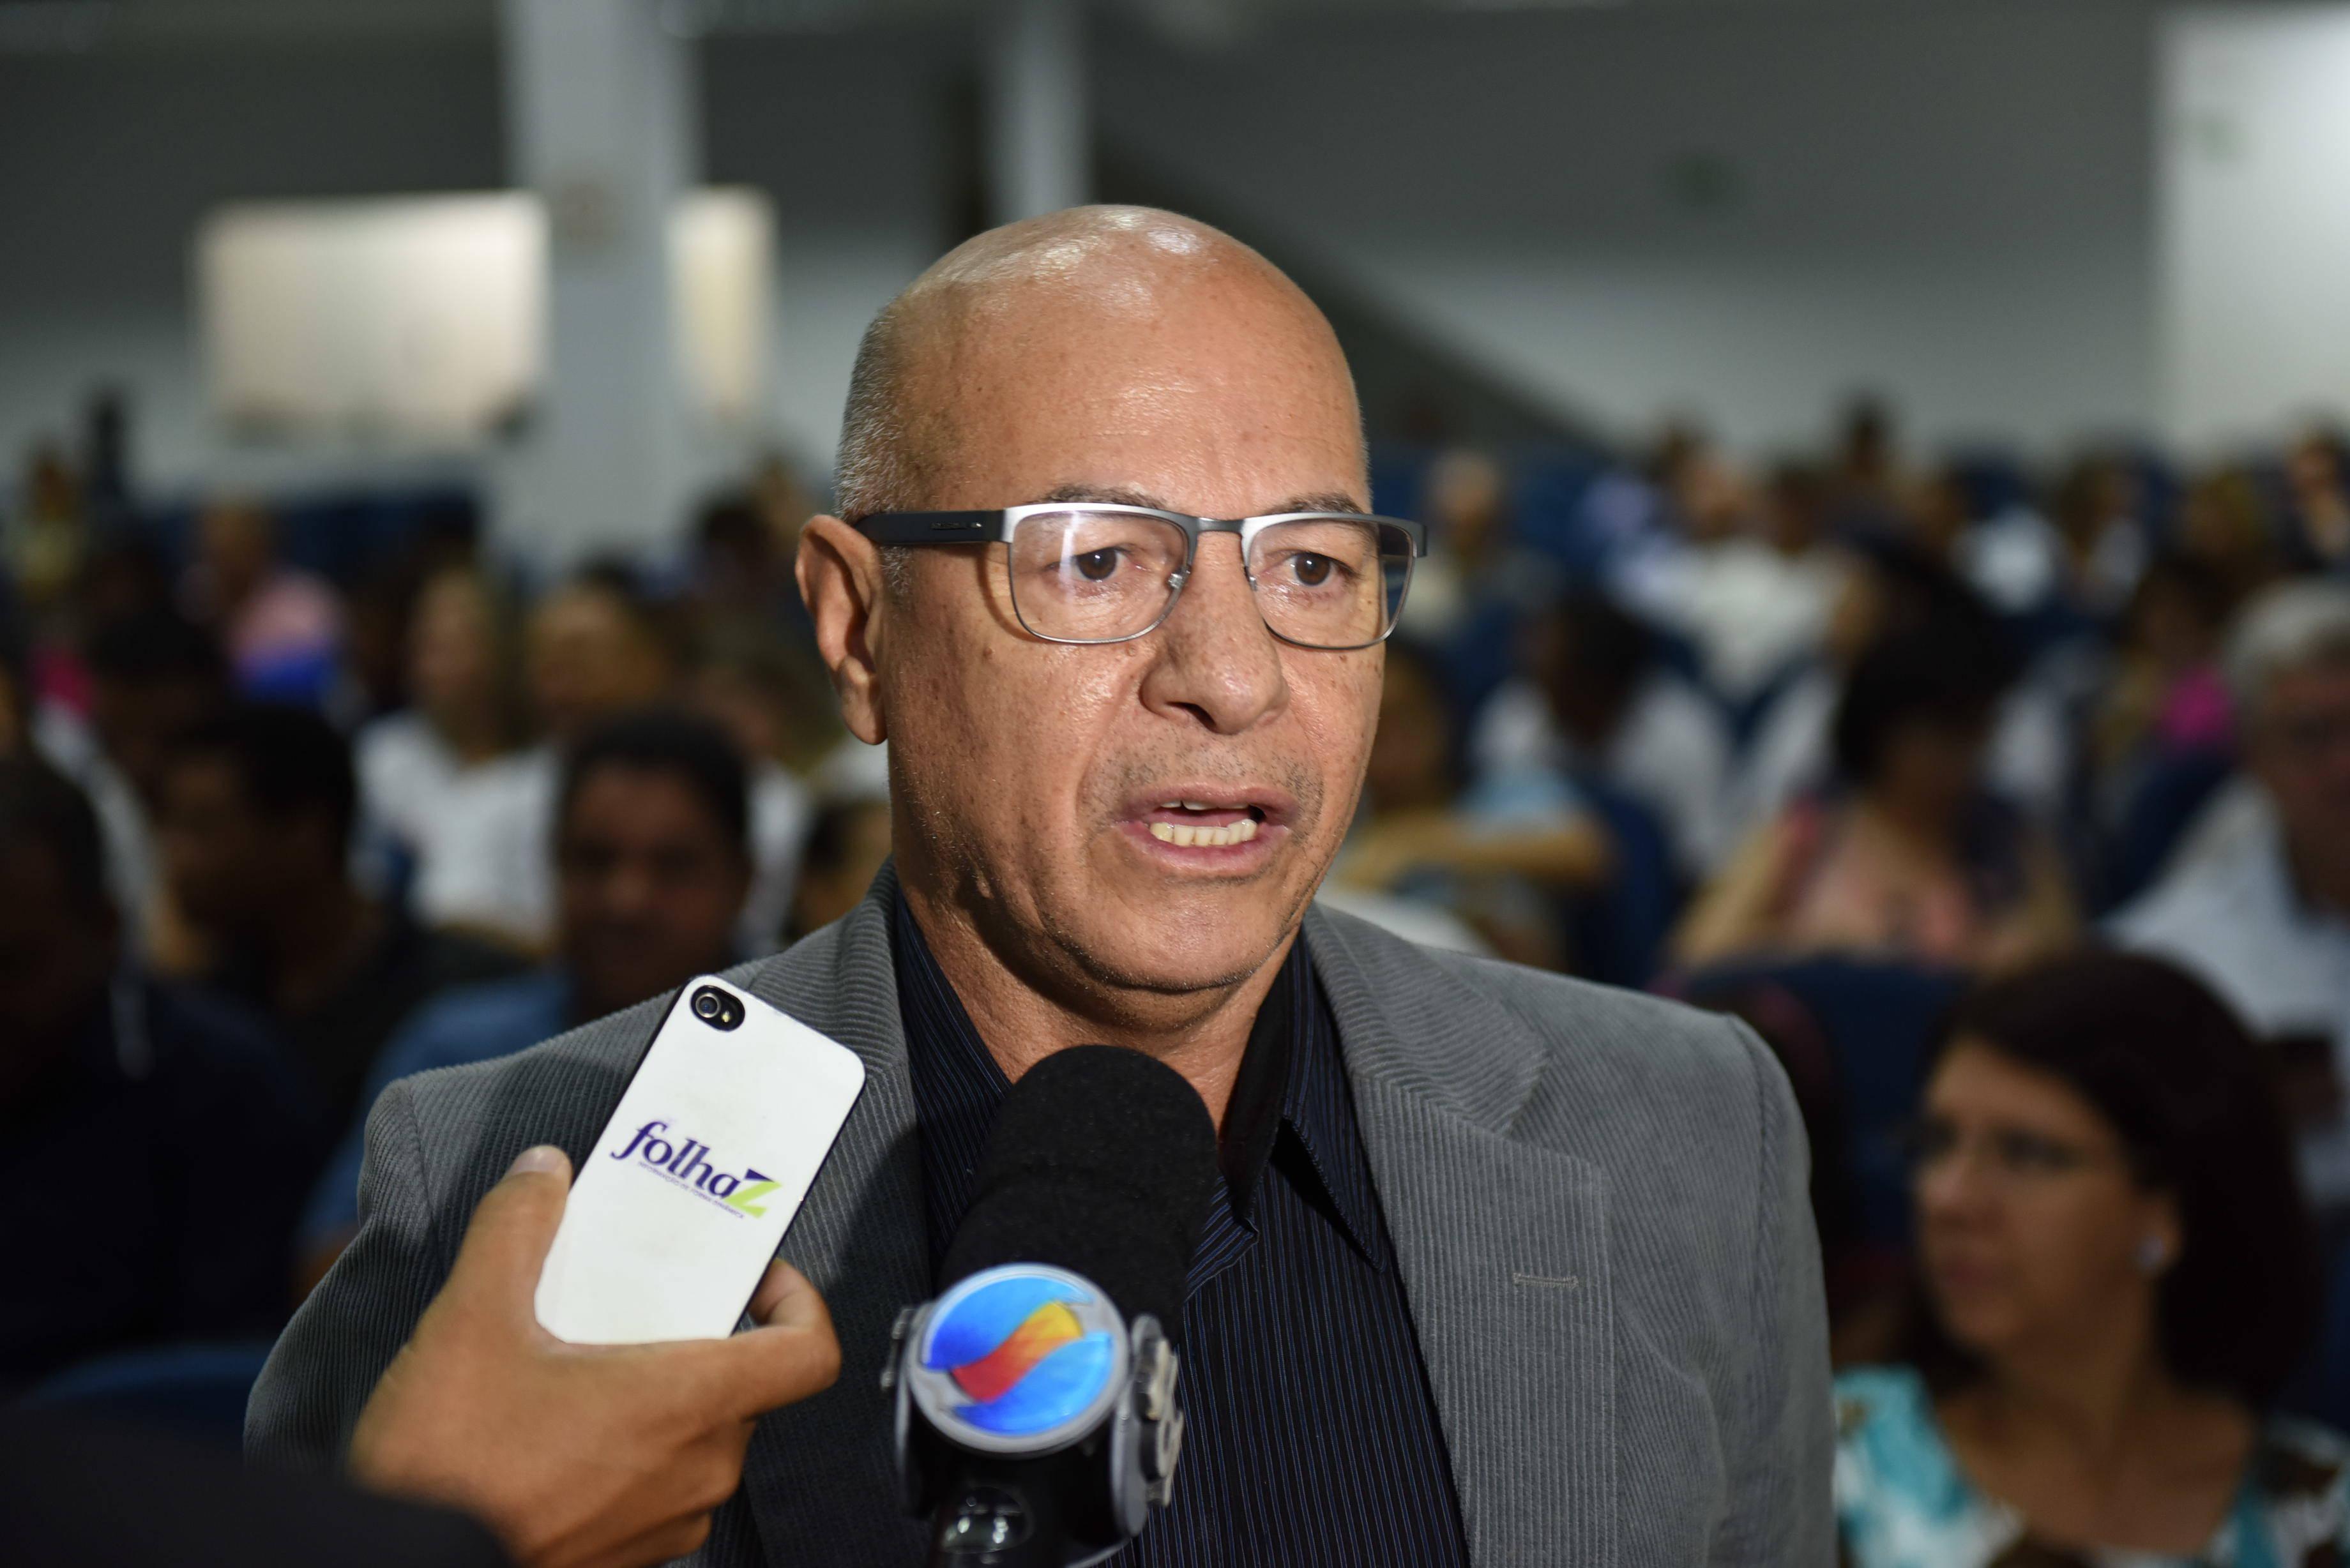 Diretor geral da Unifan, Professor Alcides | Foto: Valdemy Teixeira